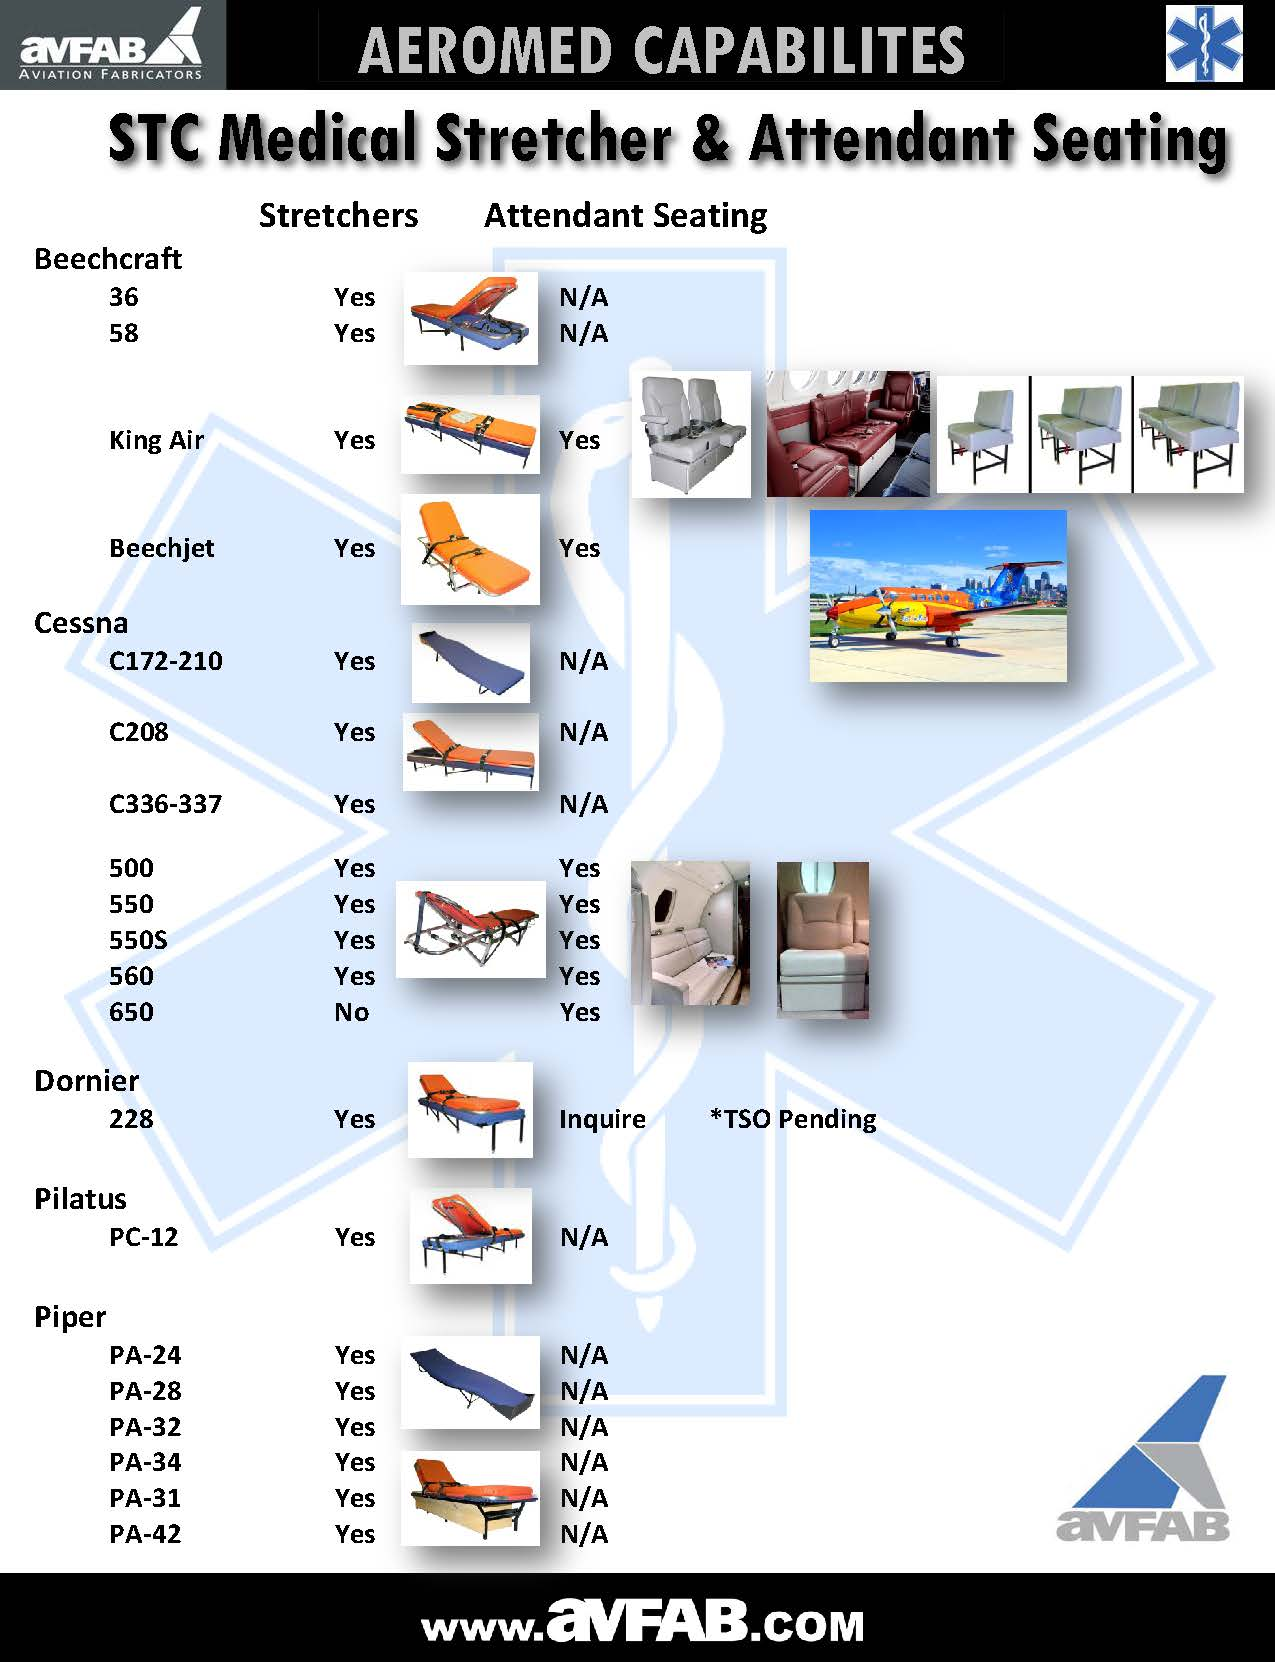 Aeromed Capabilities